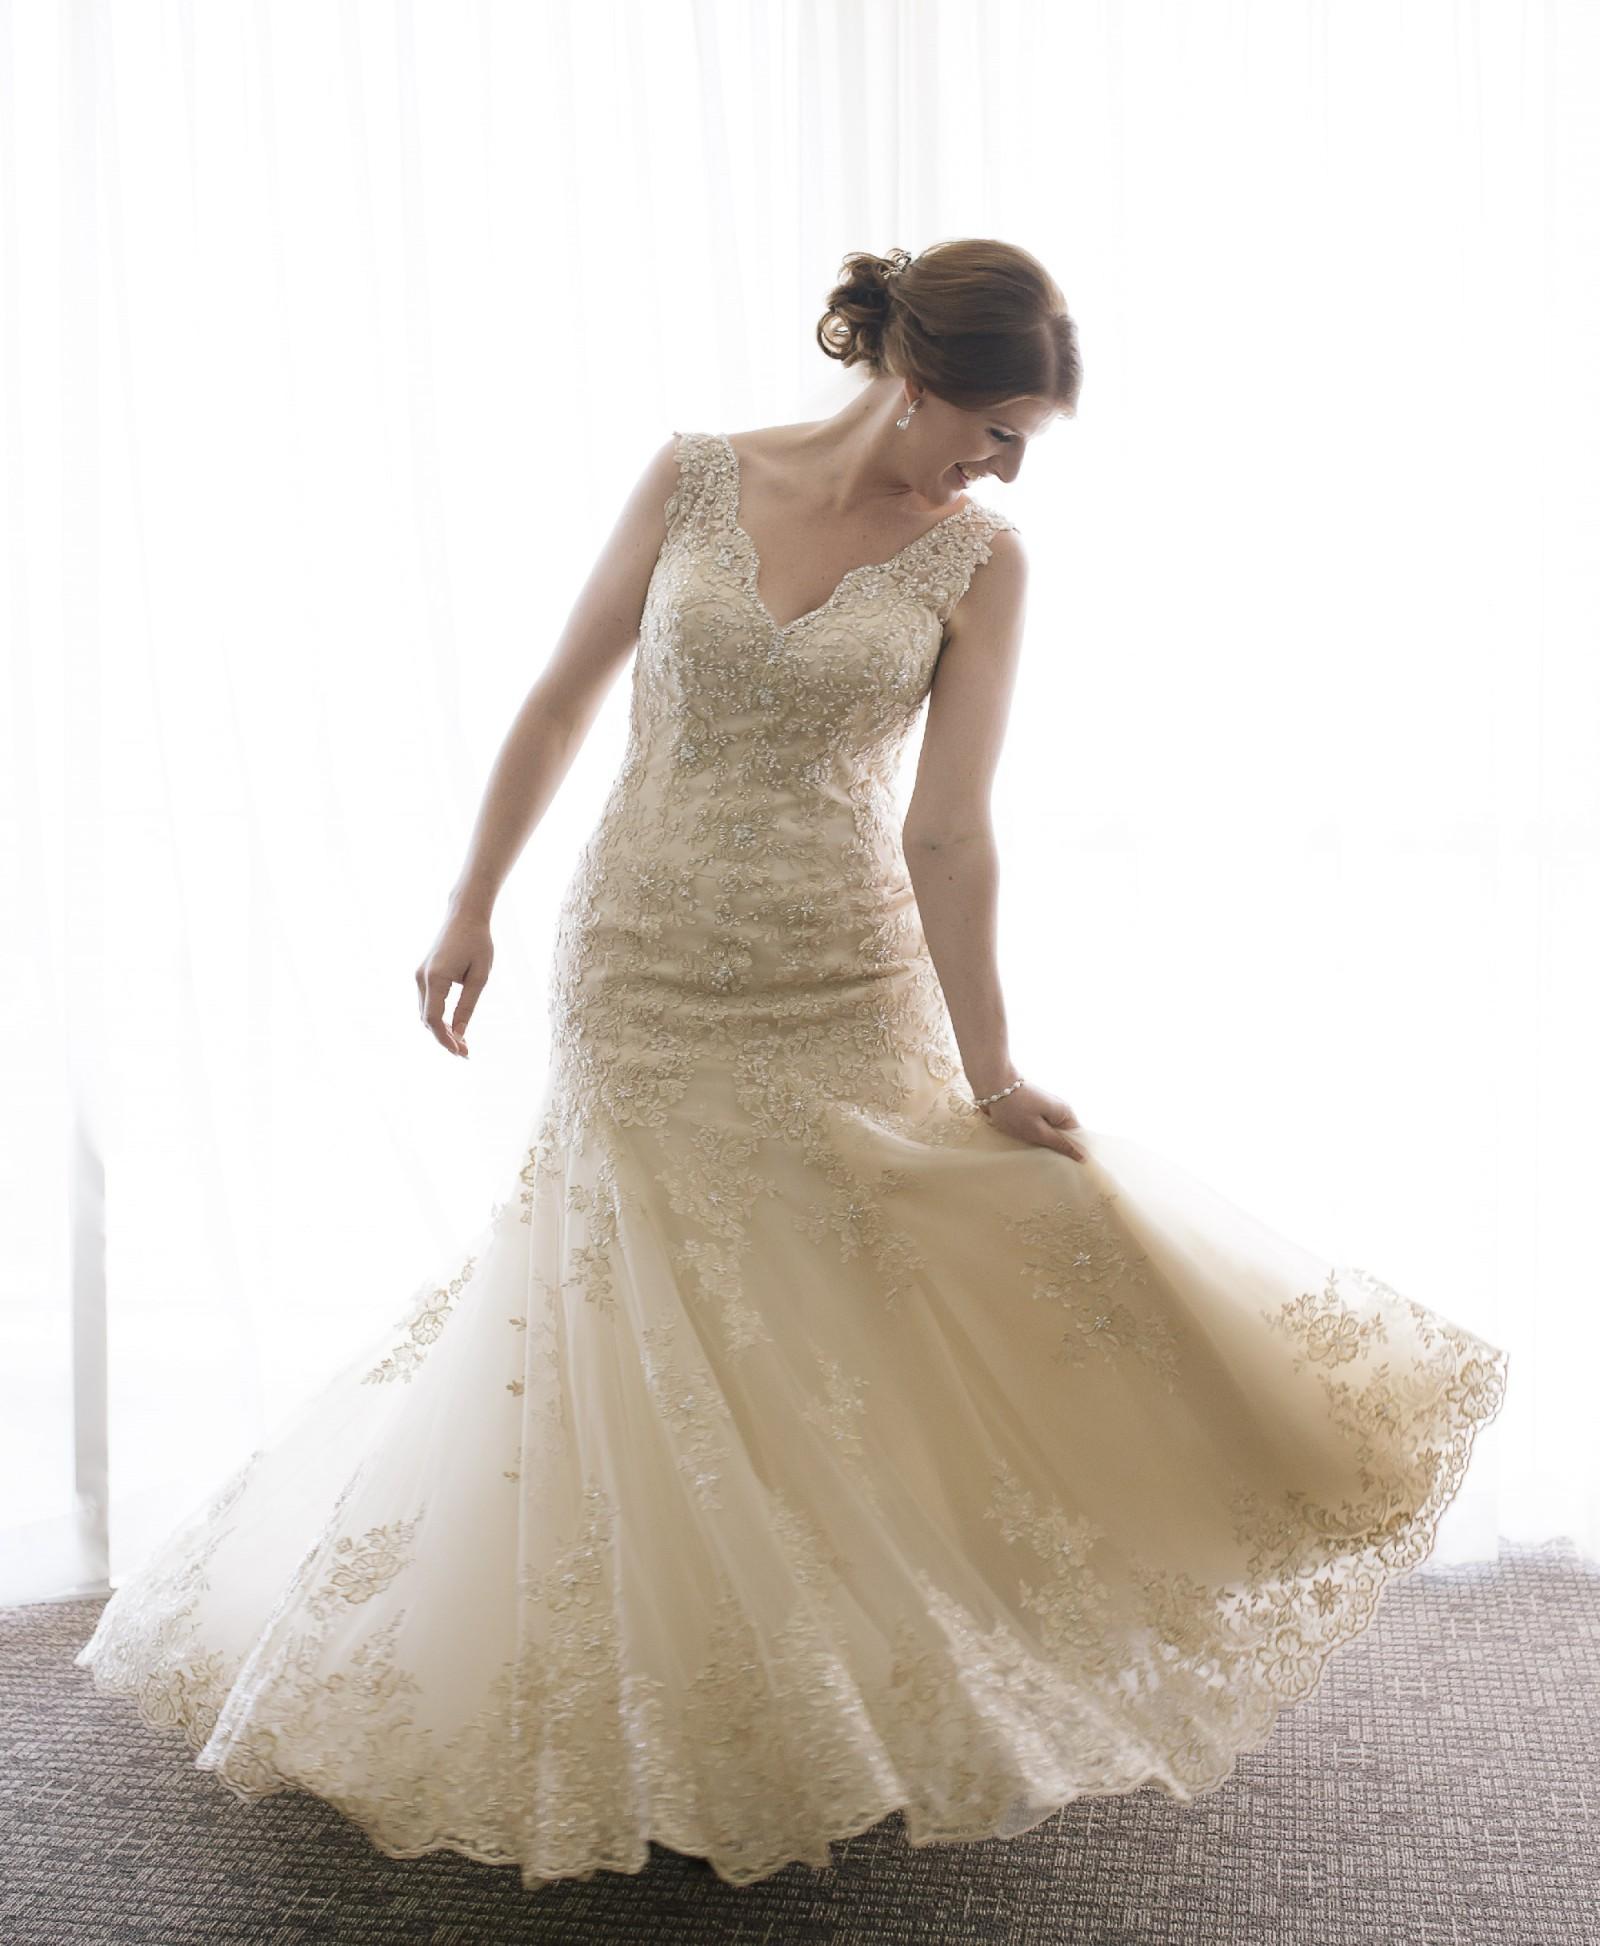 Stella york 5922 second hand wedding dress on sale 50 off for Stella york wedding dresses near me